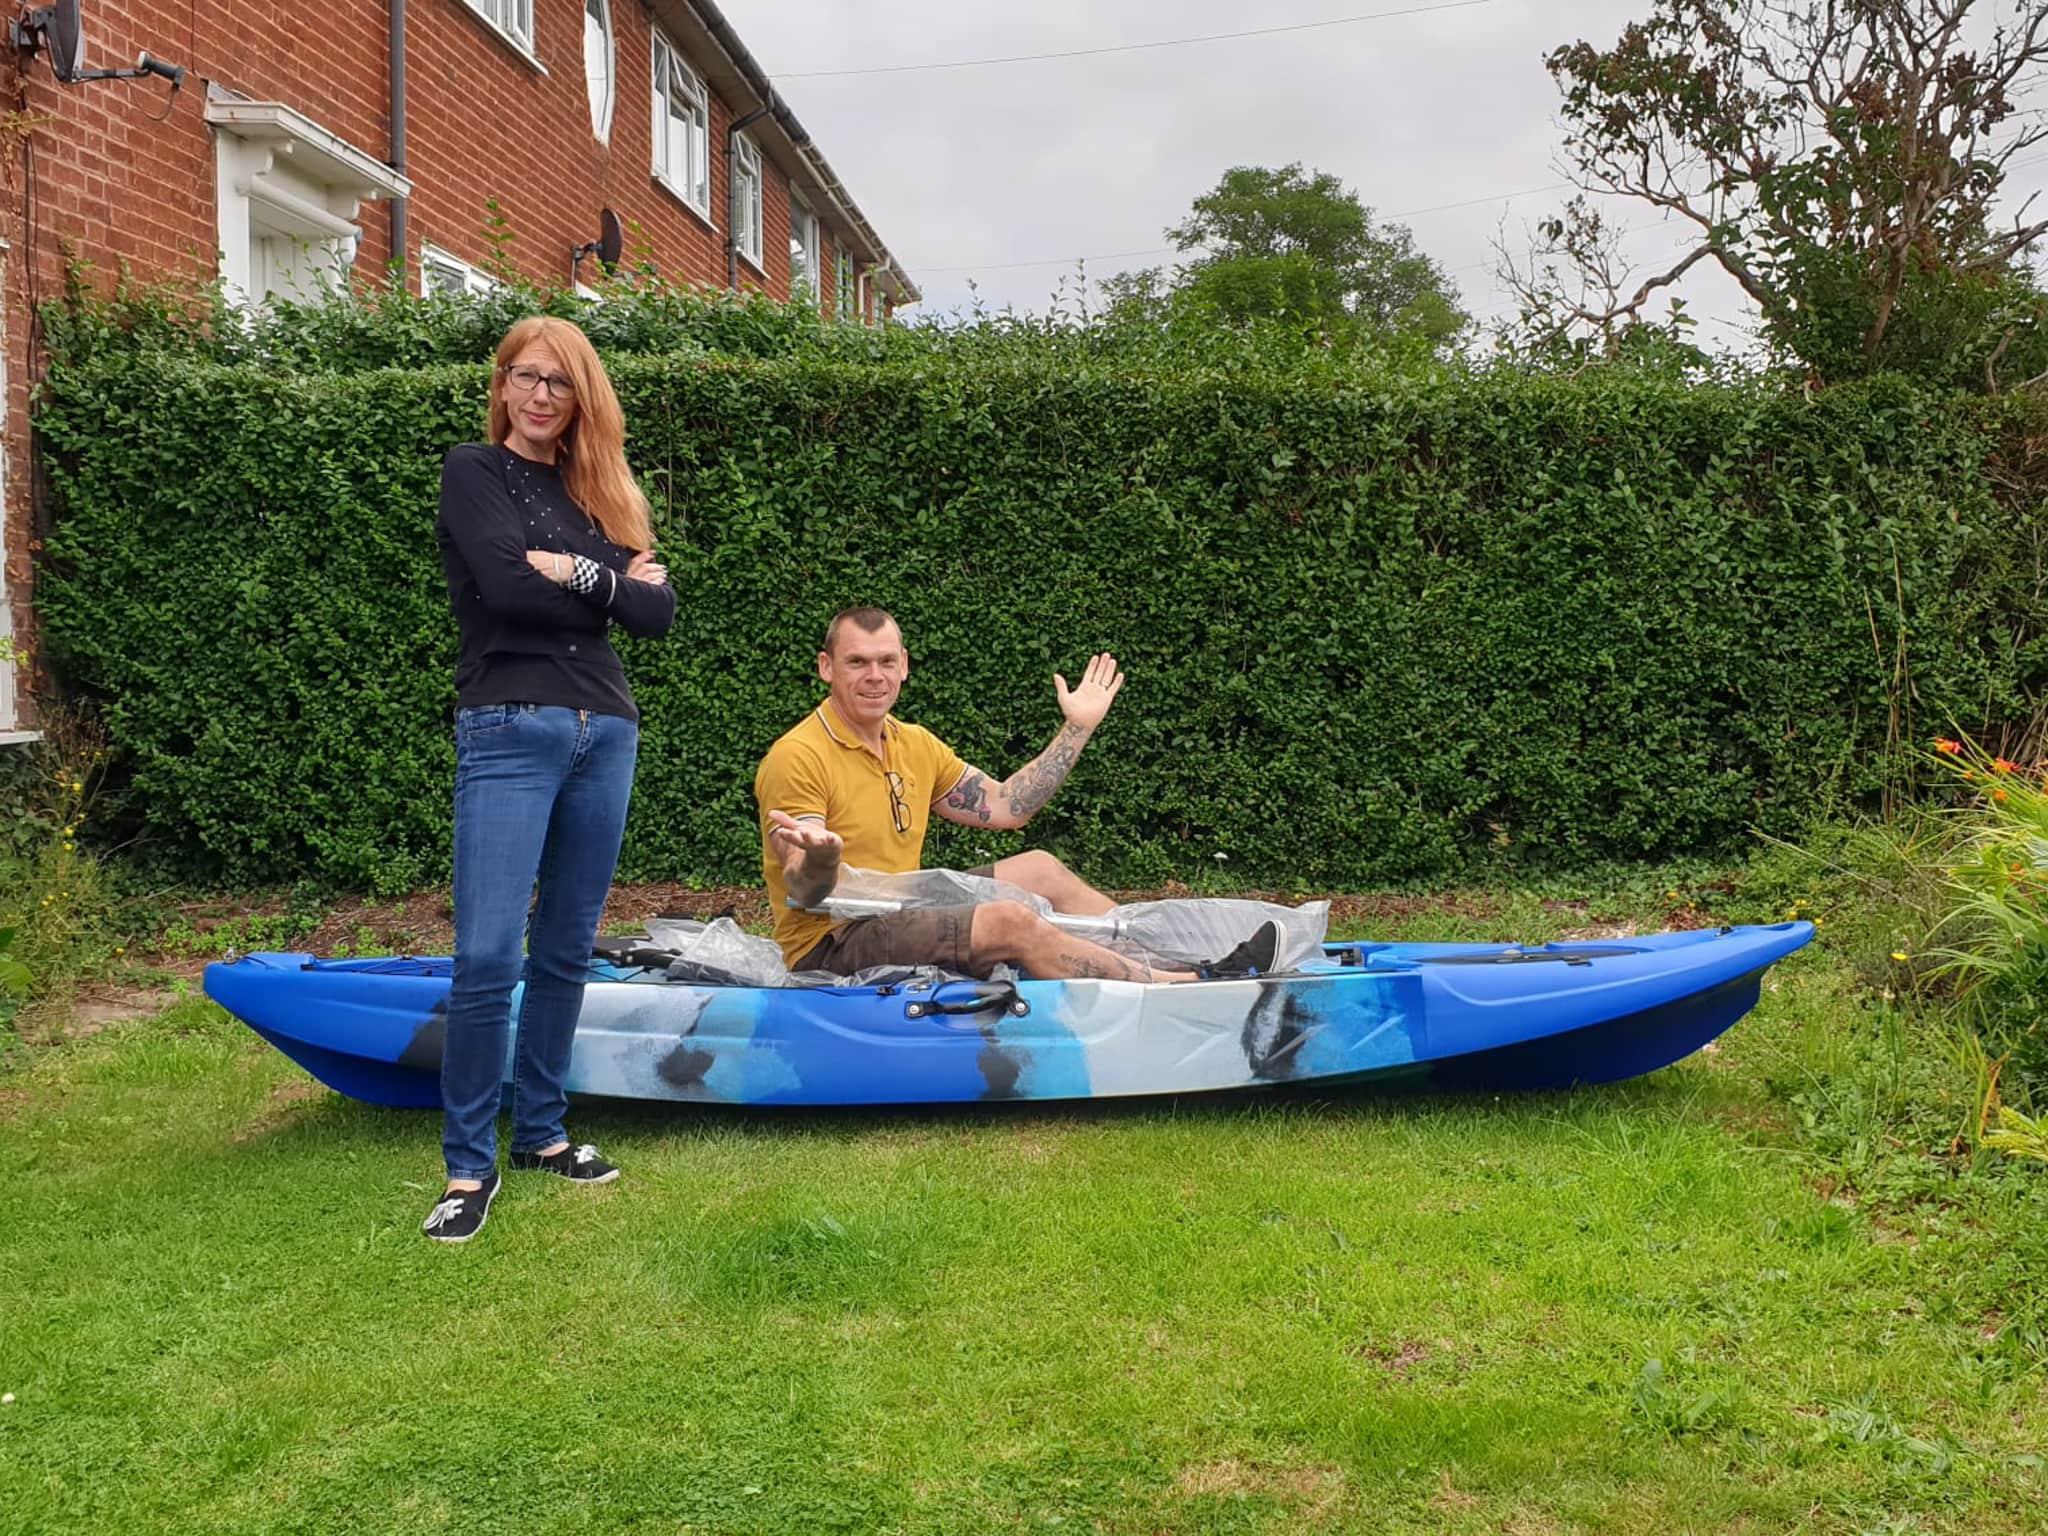 Winner Sarah Jayne Brady of a Barracuda Fishing Kayak with Fishing Chair - 9th Aug